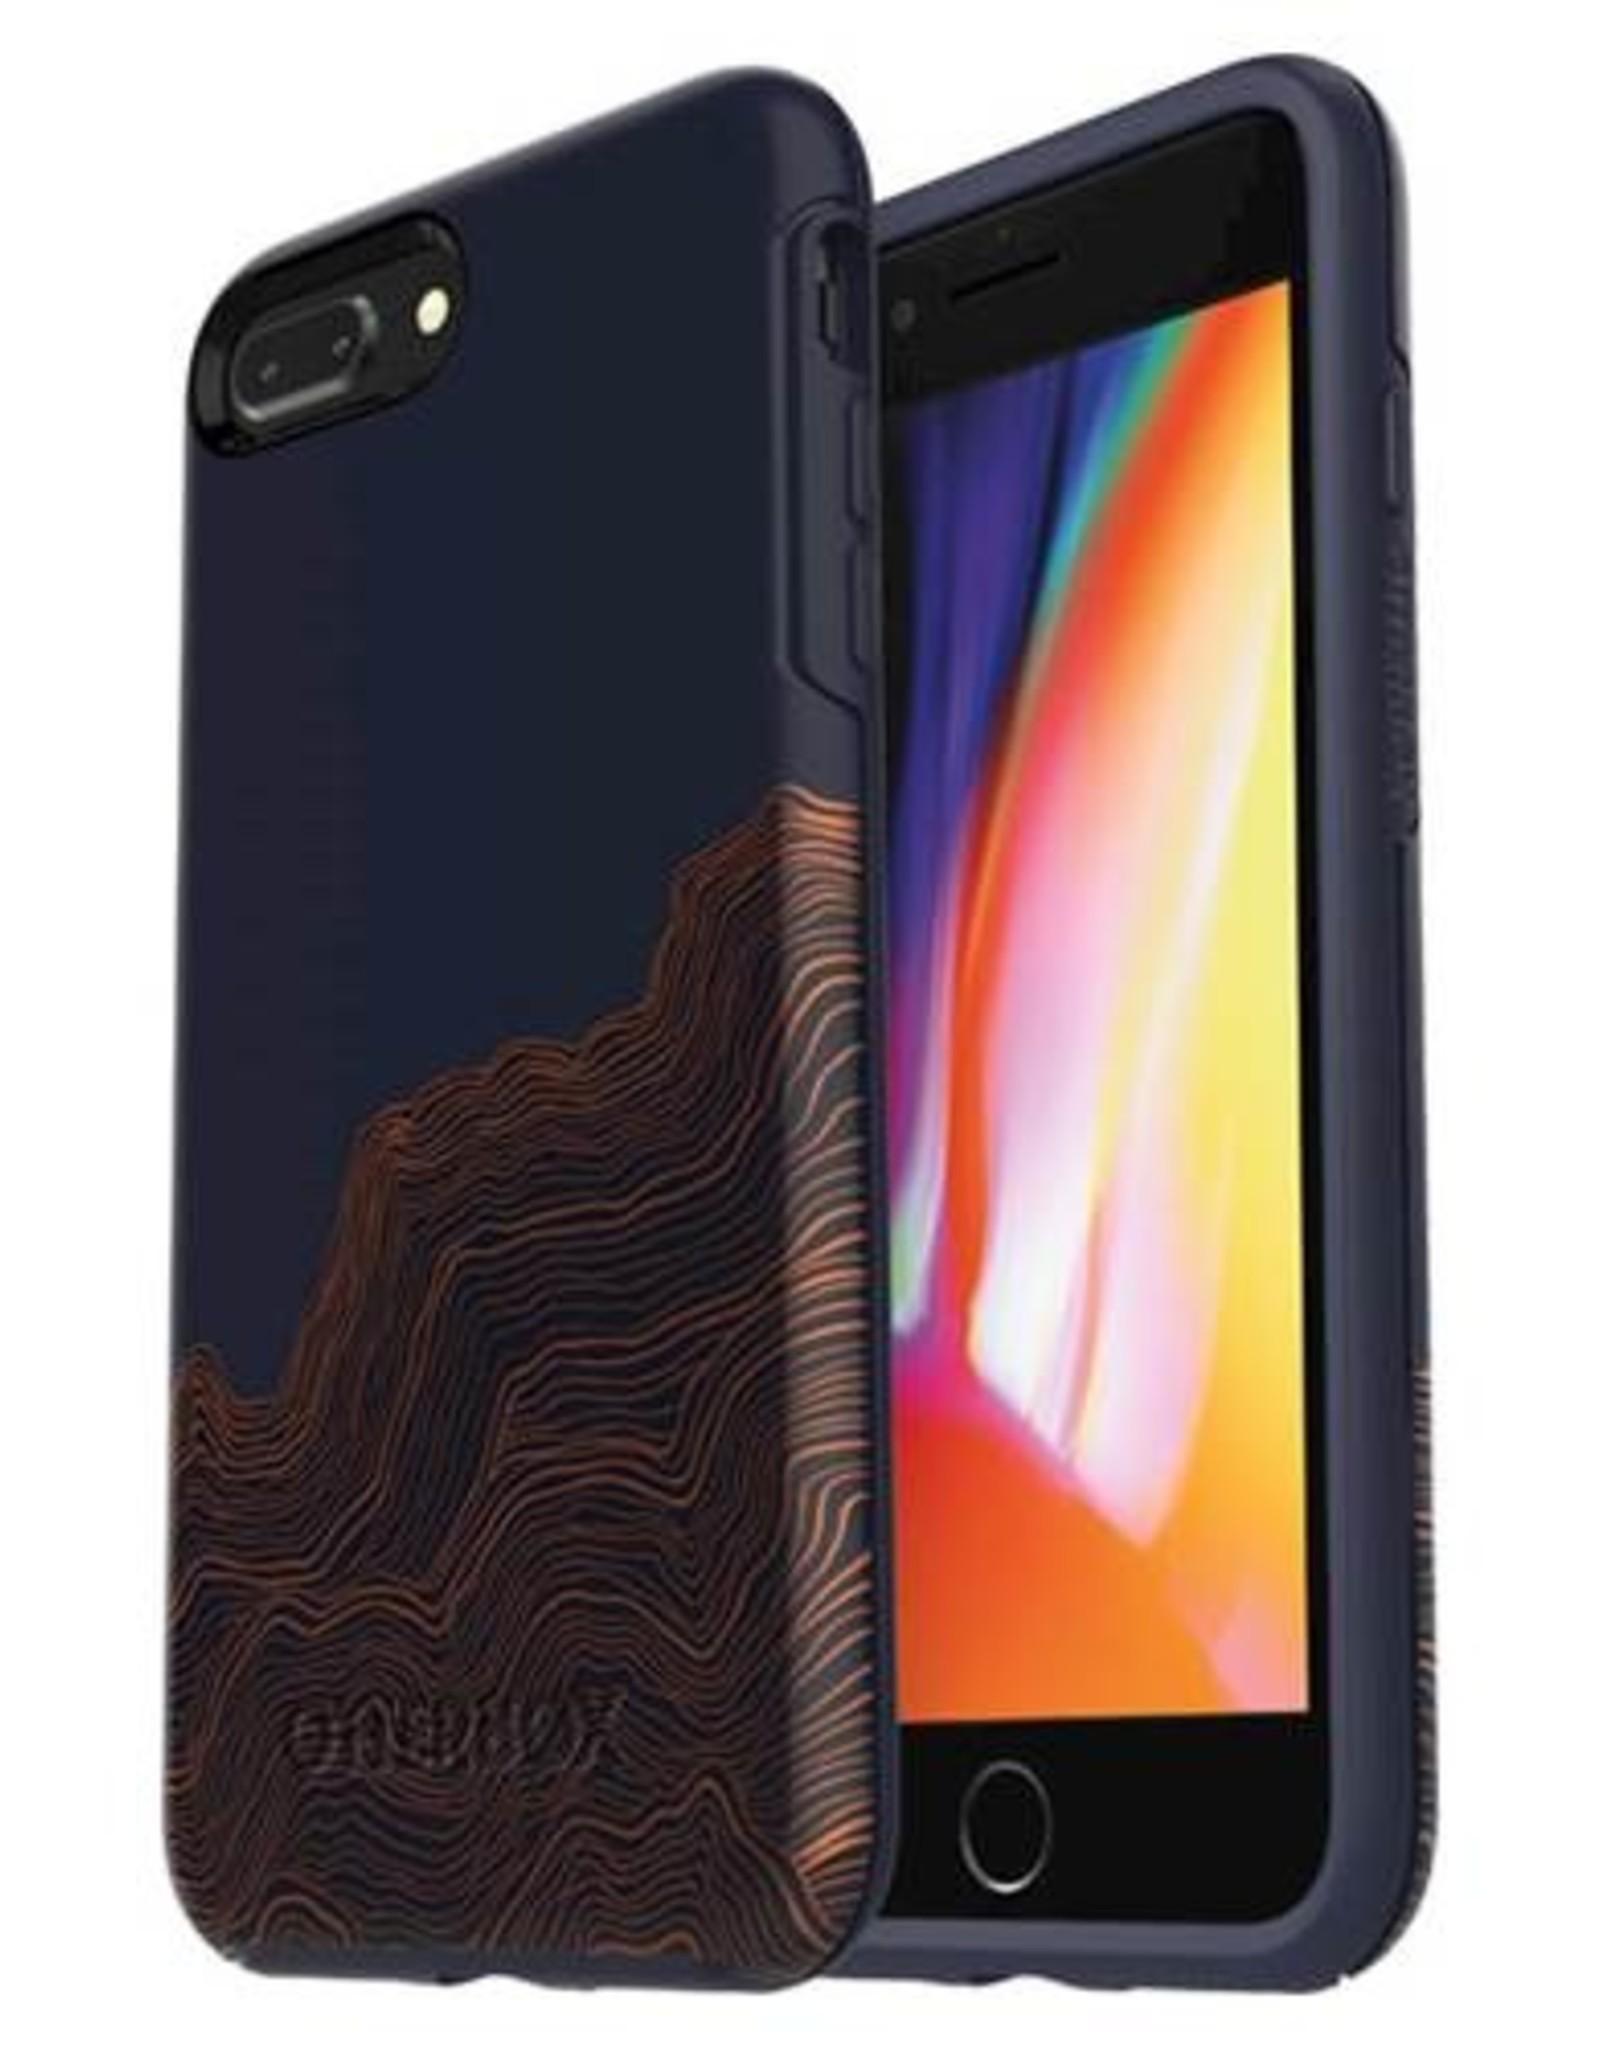 Otterbox iPhone 8 Plus/7 Plus OtterBox Blue/Brown (Good Vibrations) Symmetry Series case 15-02350